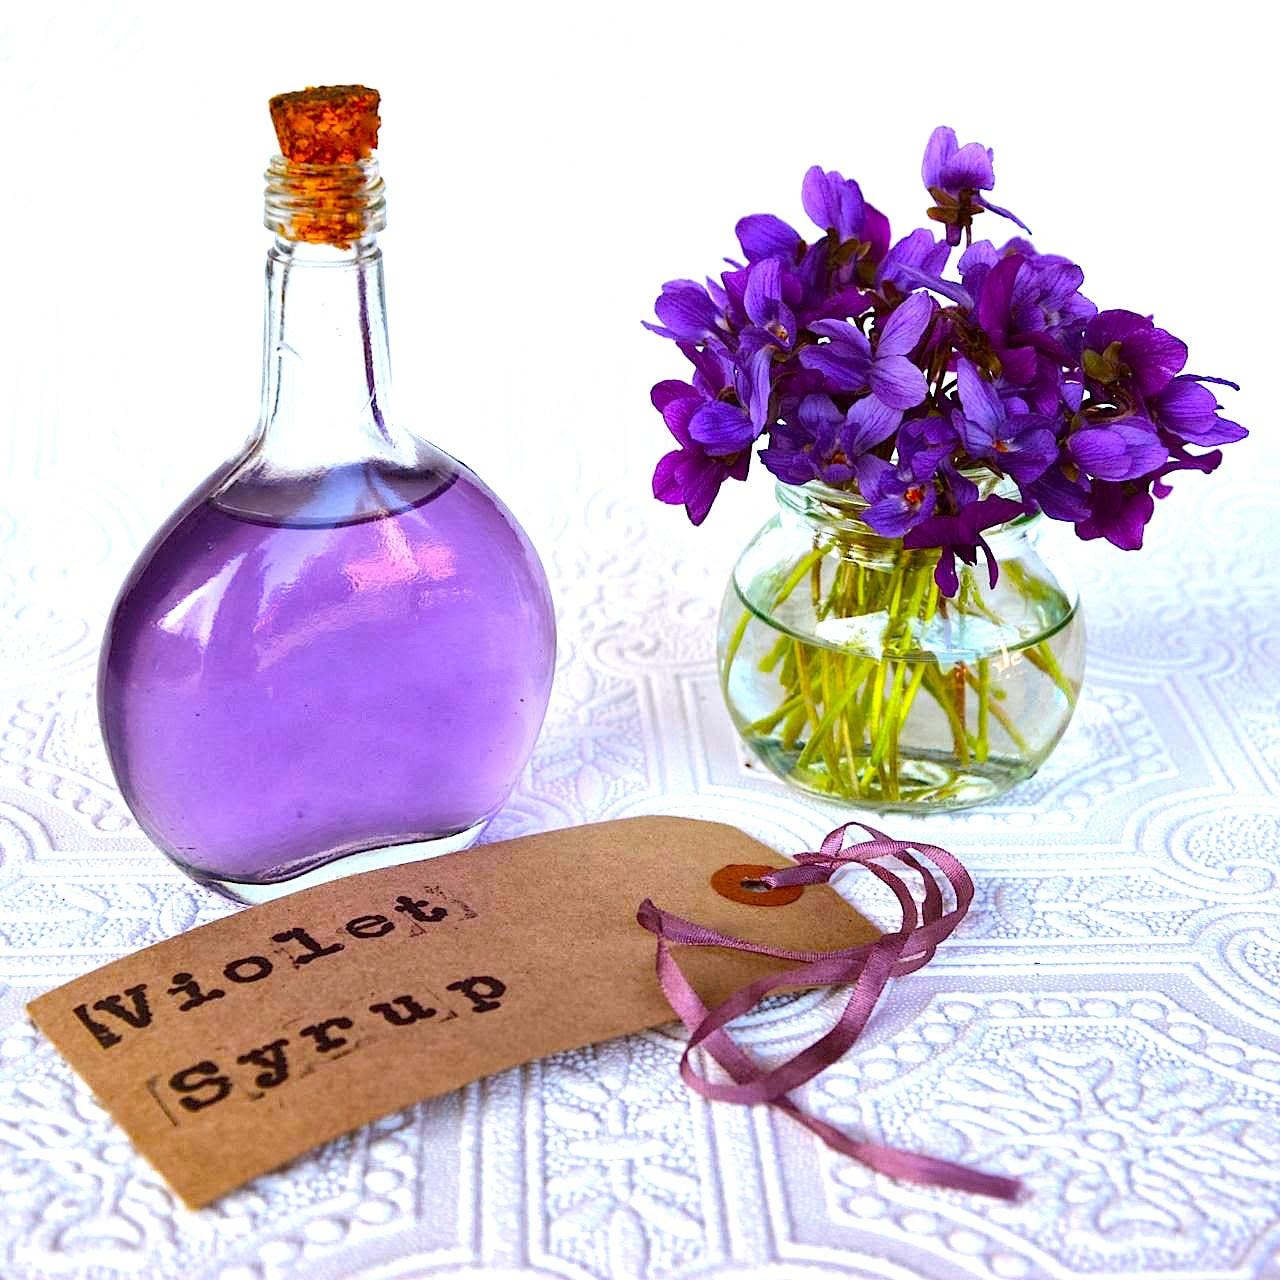 The Hirshon Violet Syrup